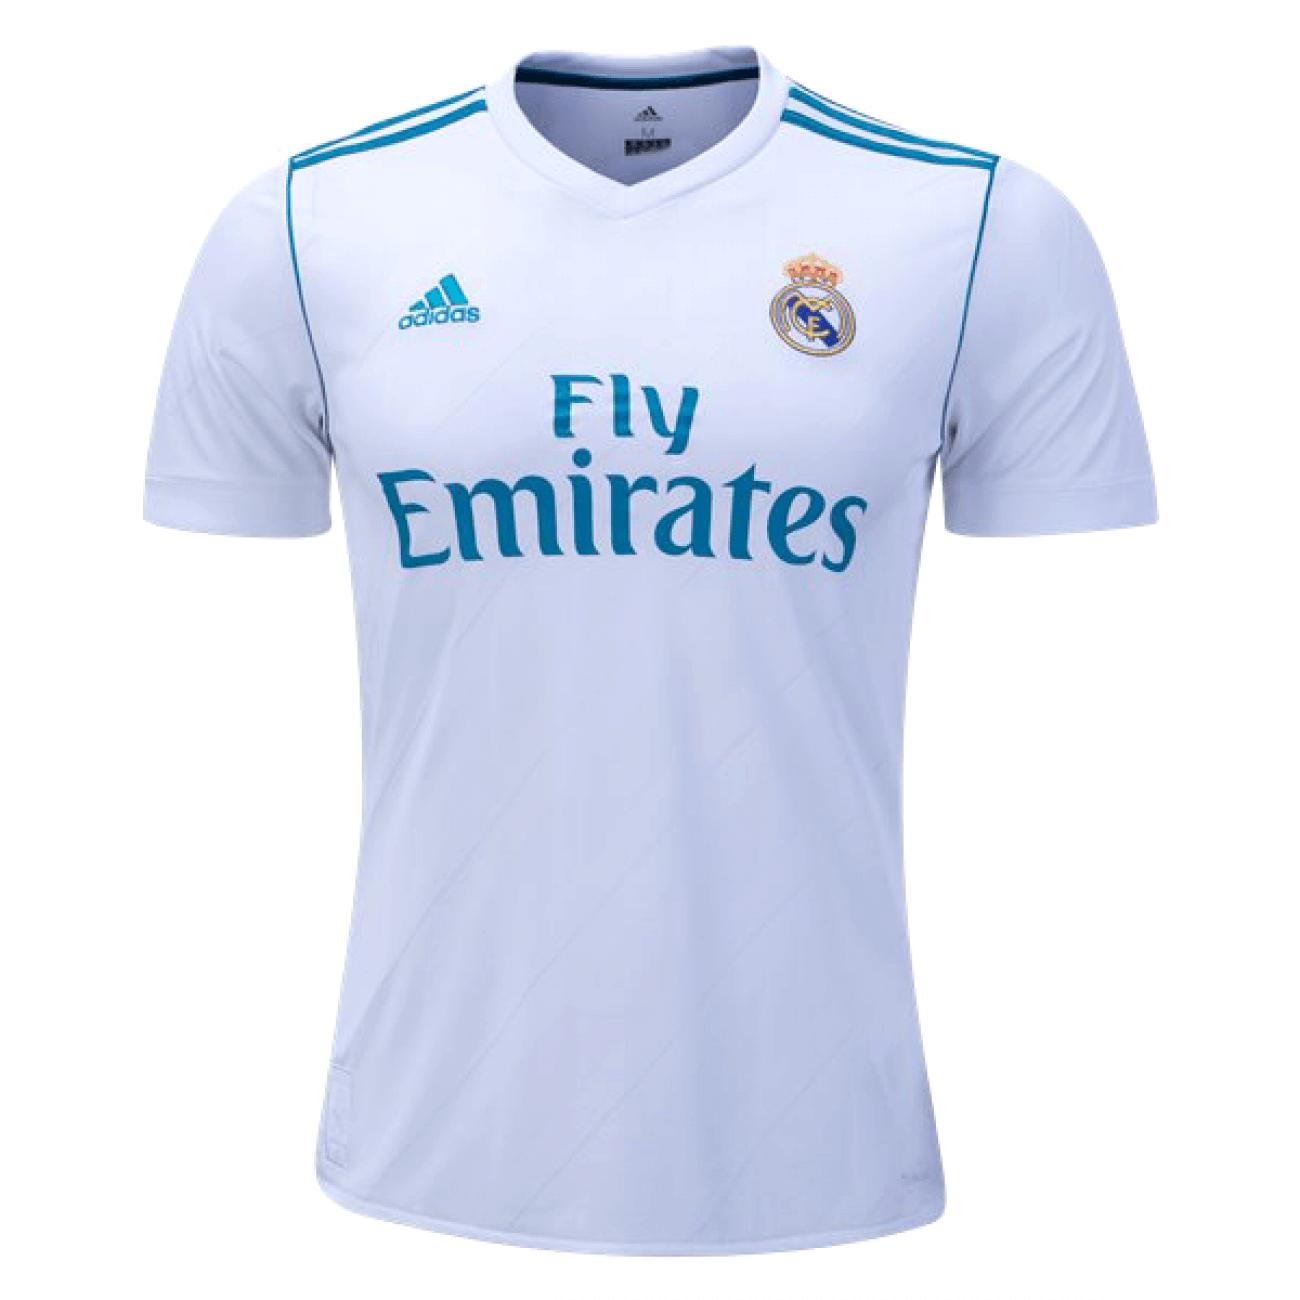 adidas shirt 2017